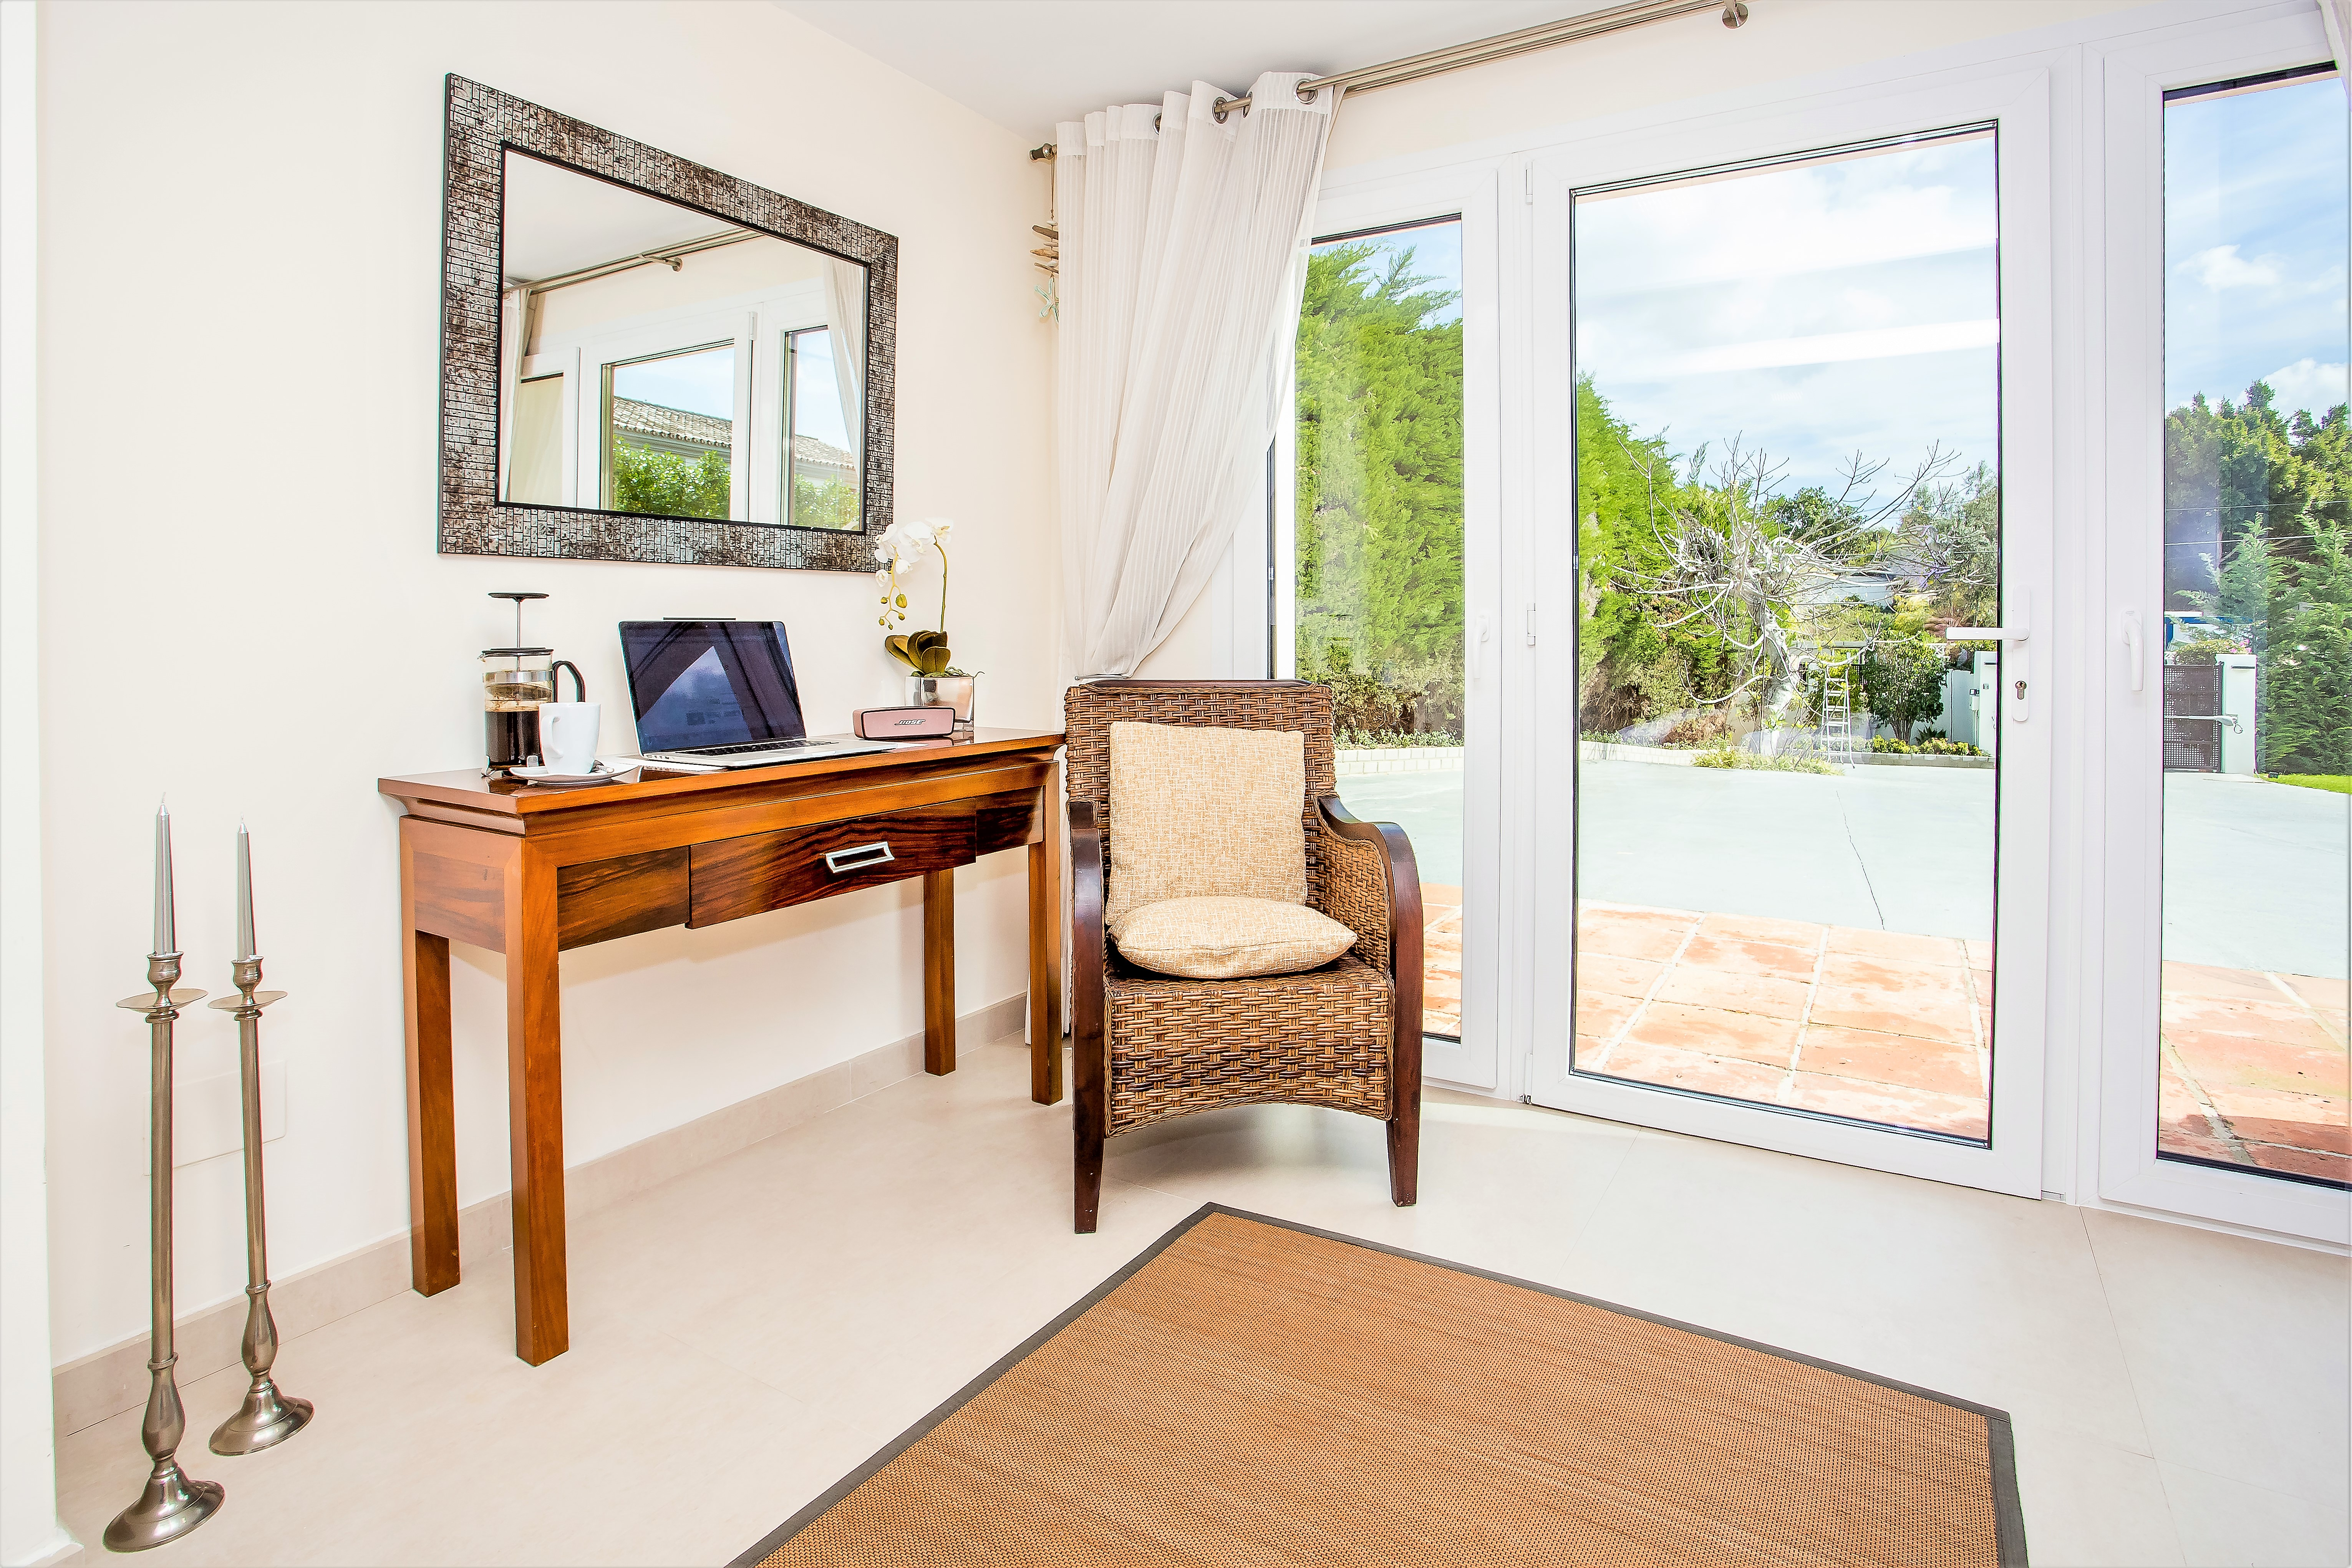 Apartment 4 B R  VILLA by Puerto Banus   Sea 5 m                                photo 20349118